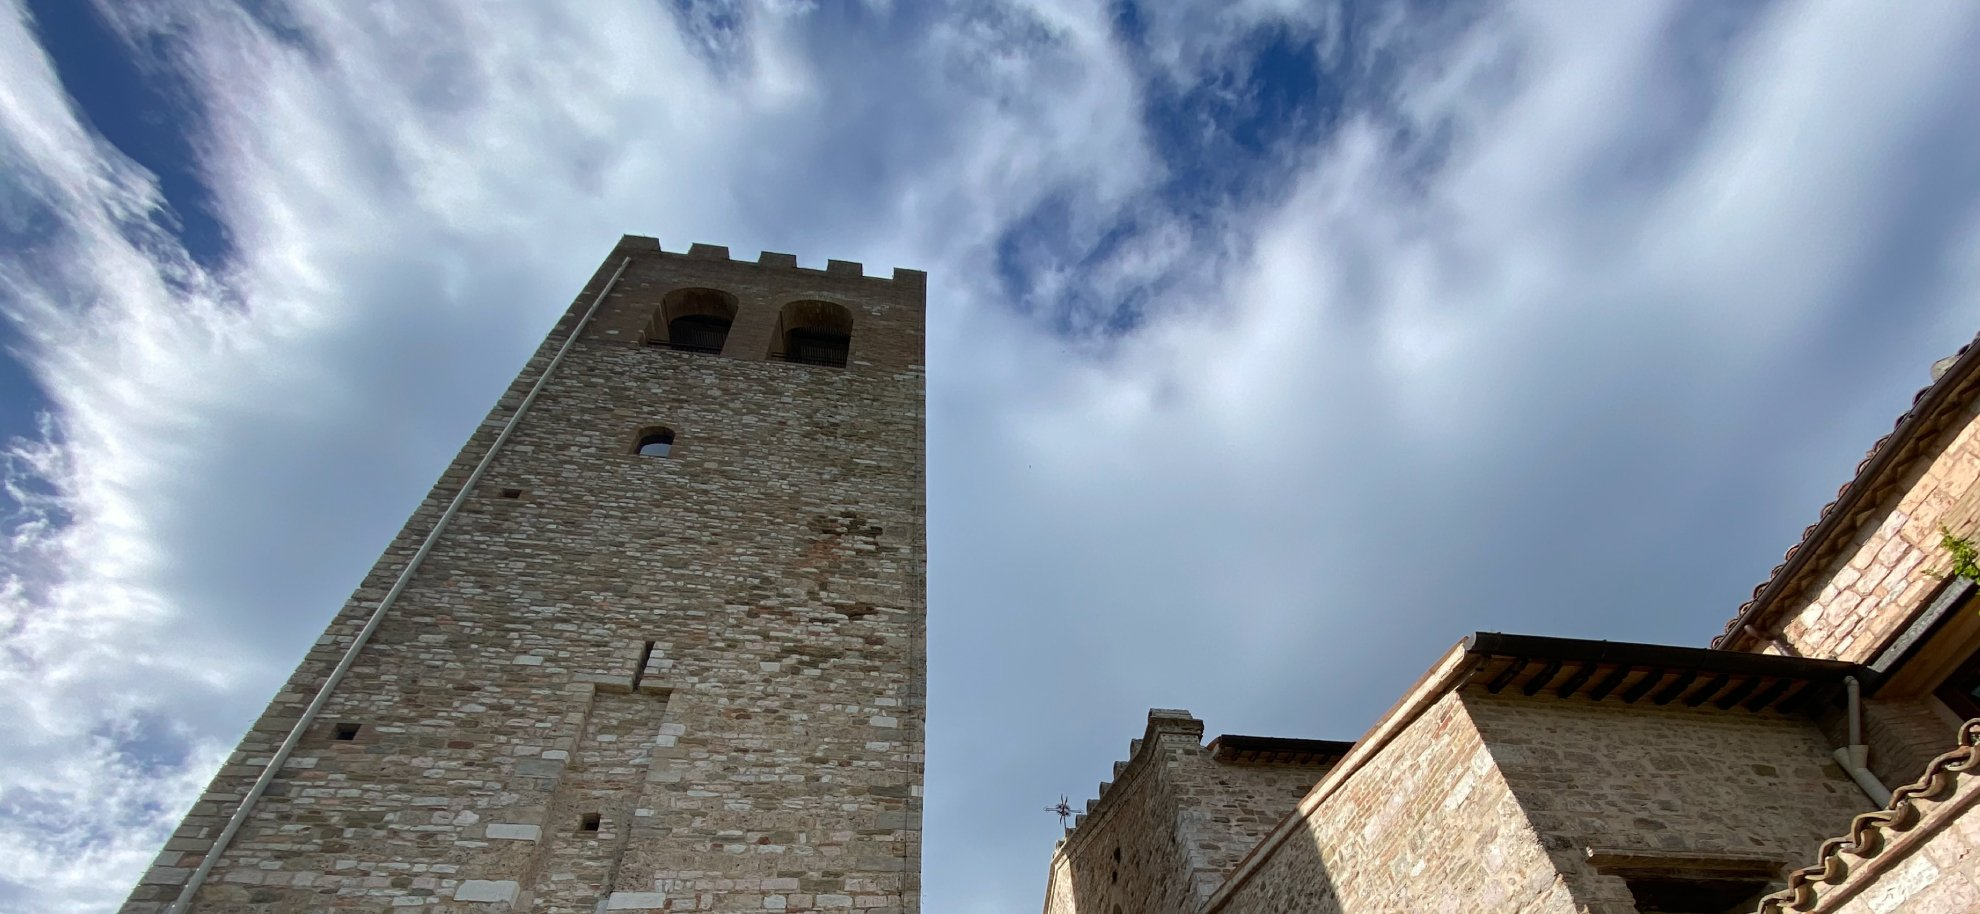 Promesse d'amore nella storia a Nocera Umbra